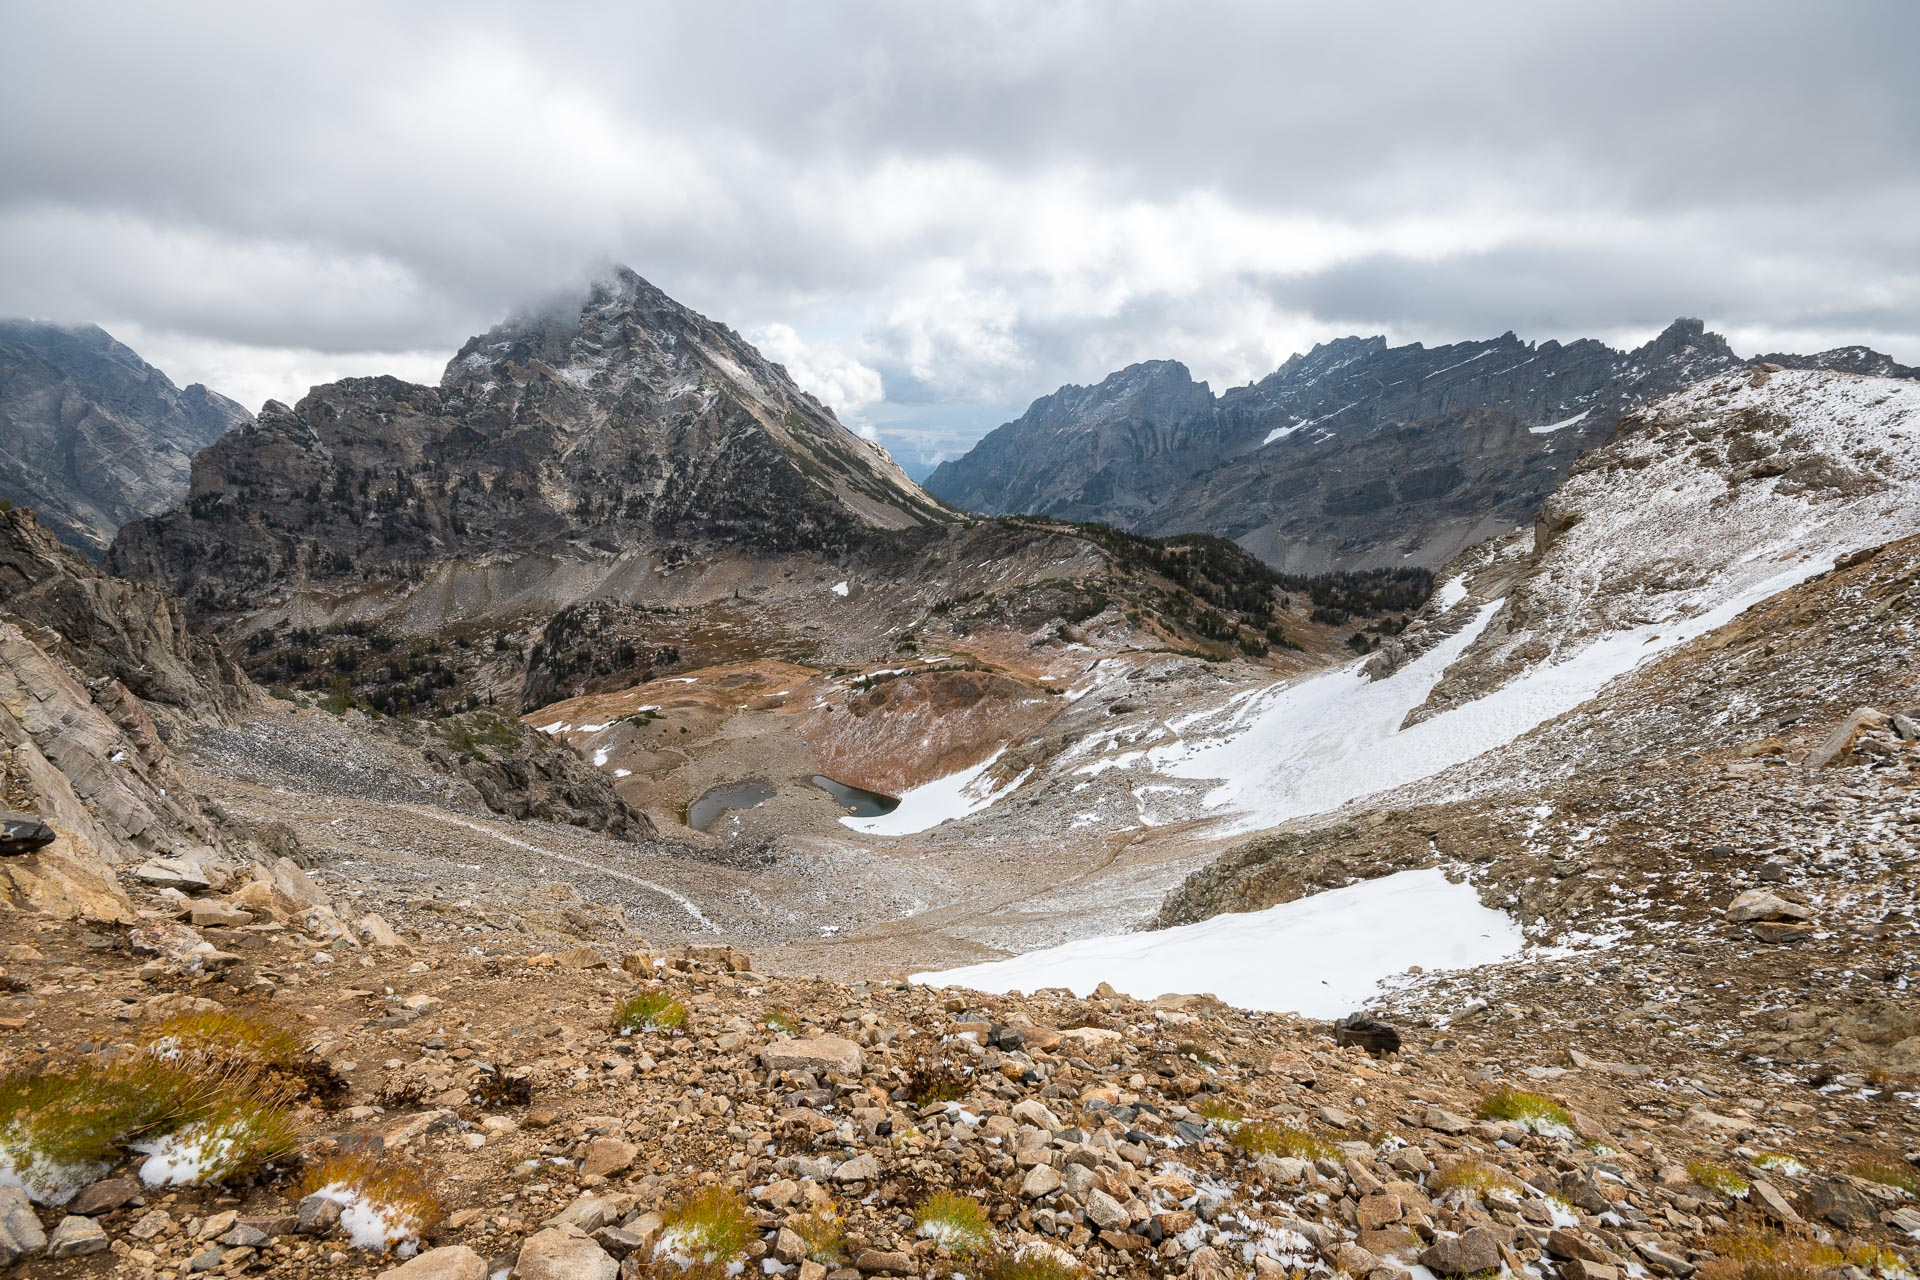 Mt. Woodring & unnamed laklets